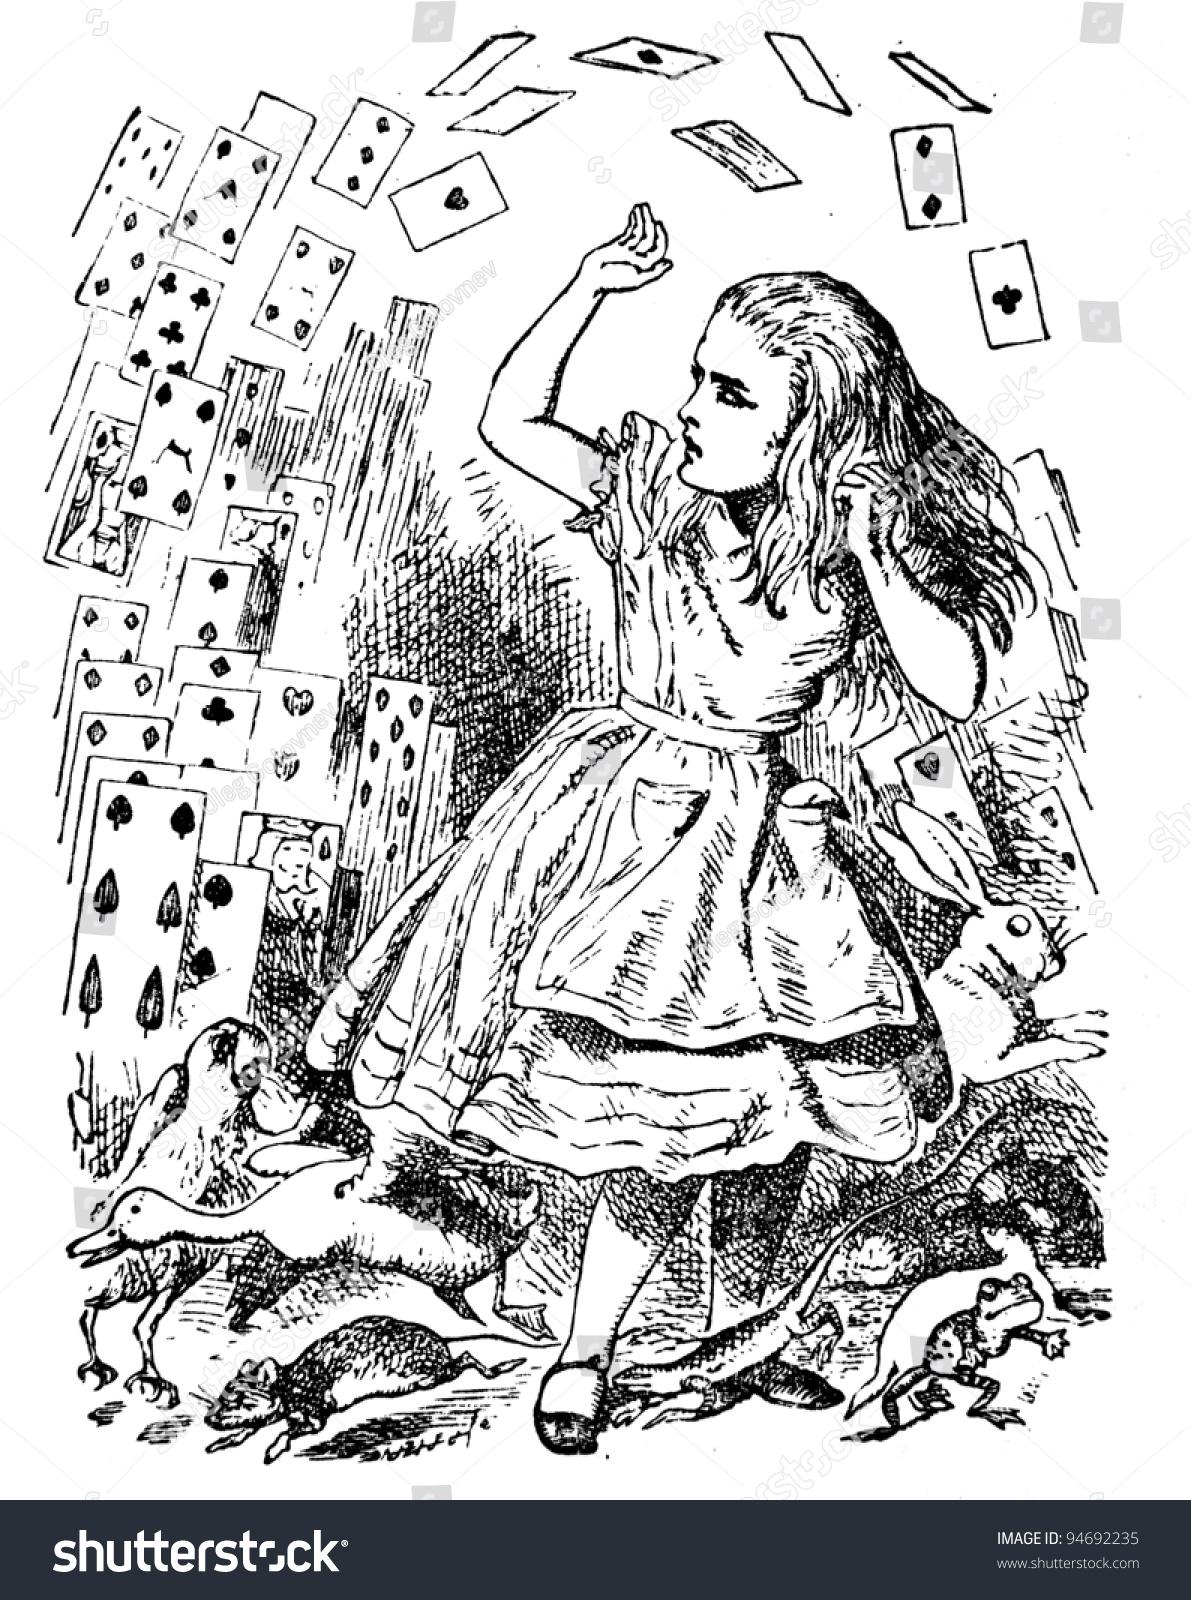 Alice Deck Cards Engraving By John Stockfoto (Jetzt bearbeiten ...